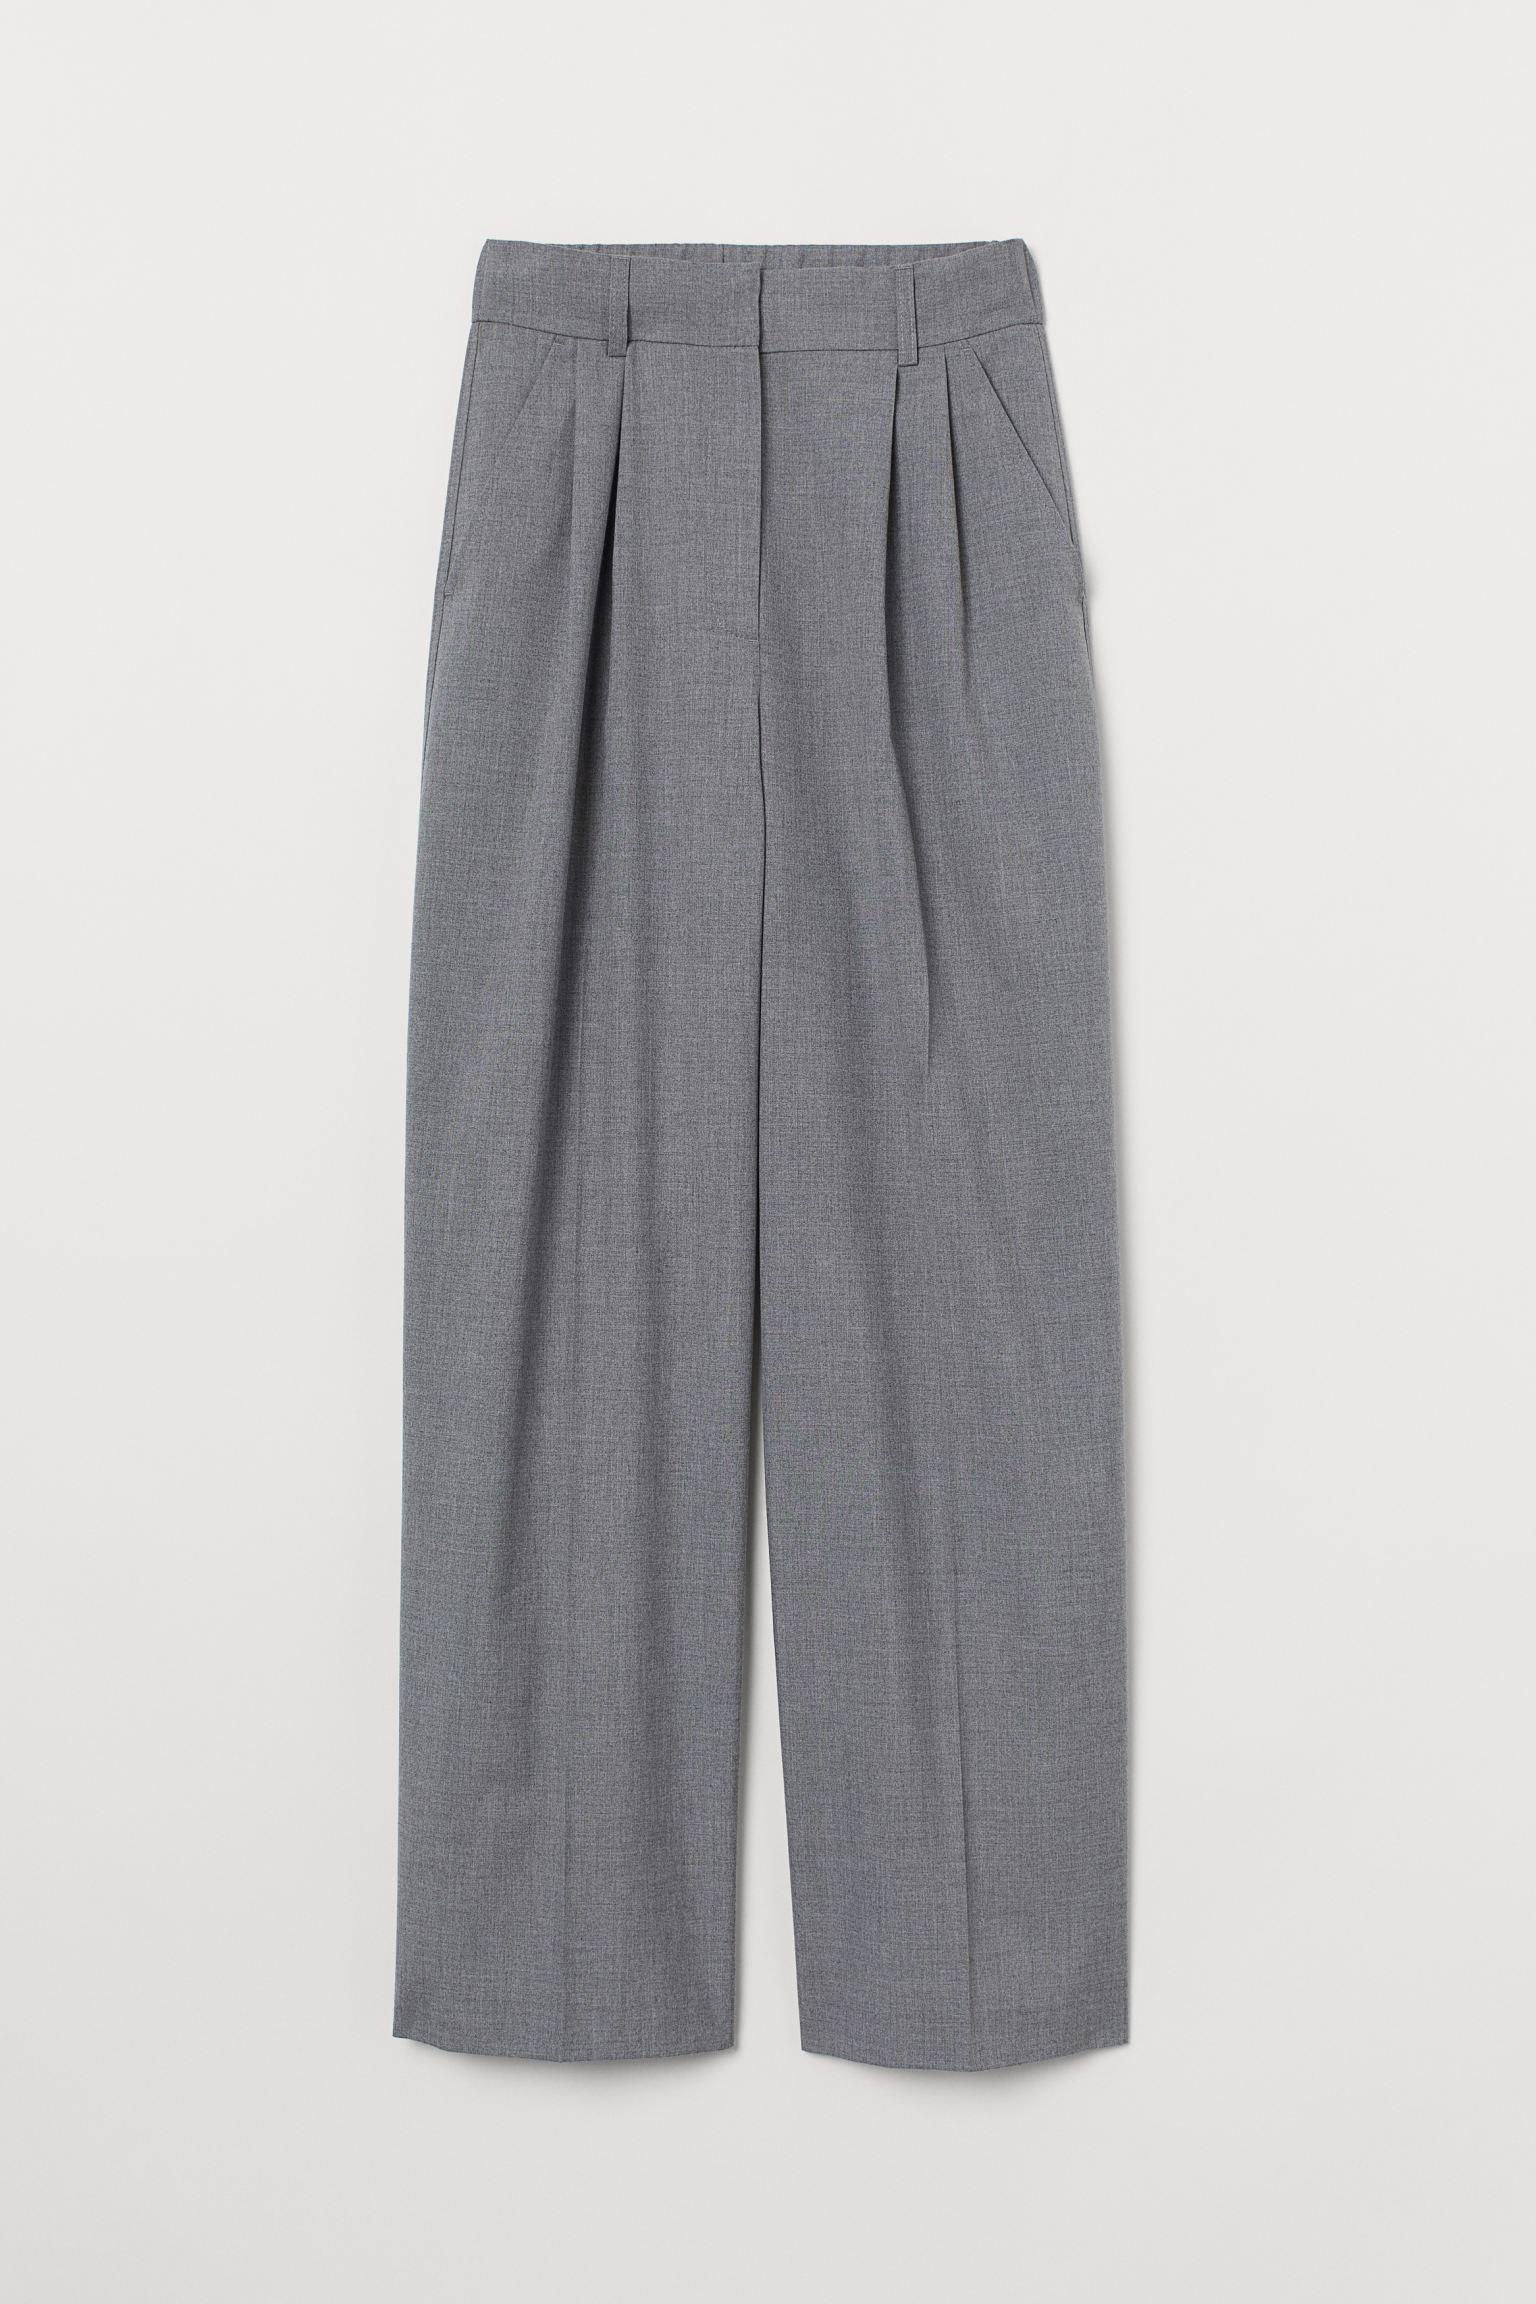 Pantalón amplio de vestir